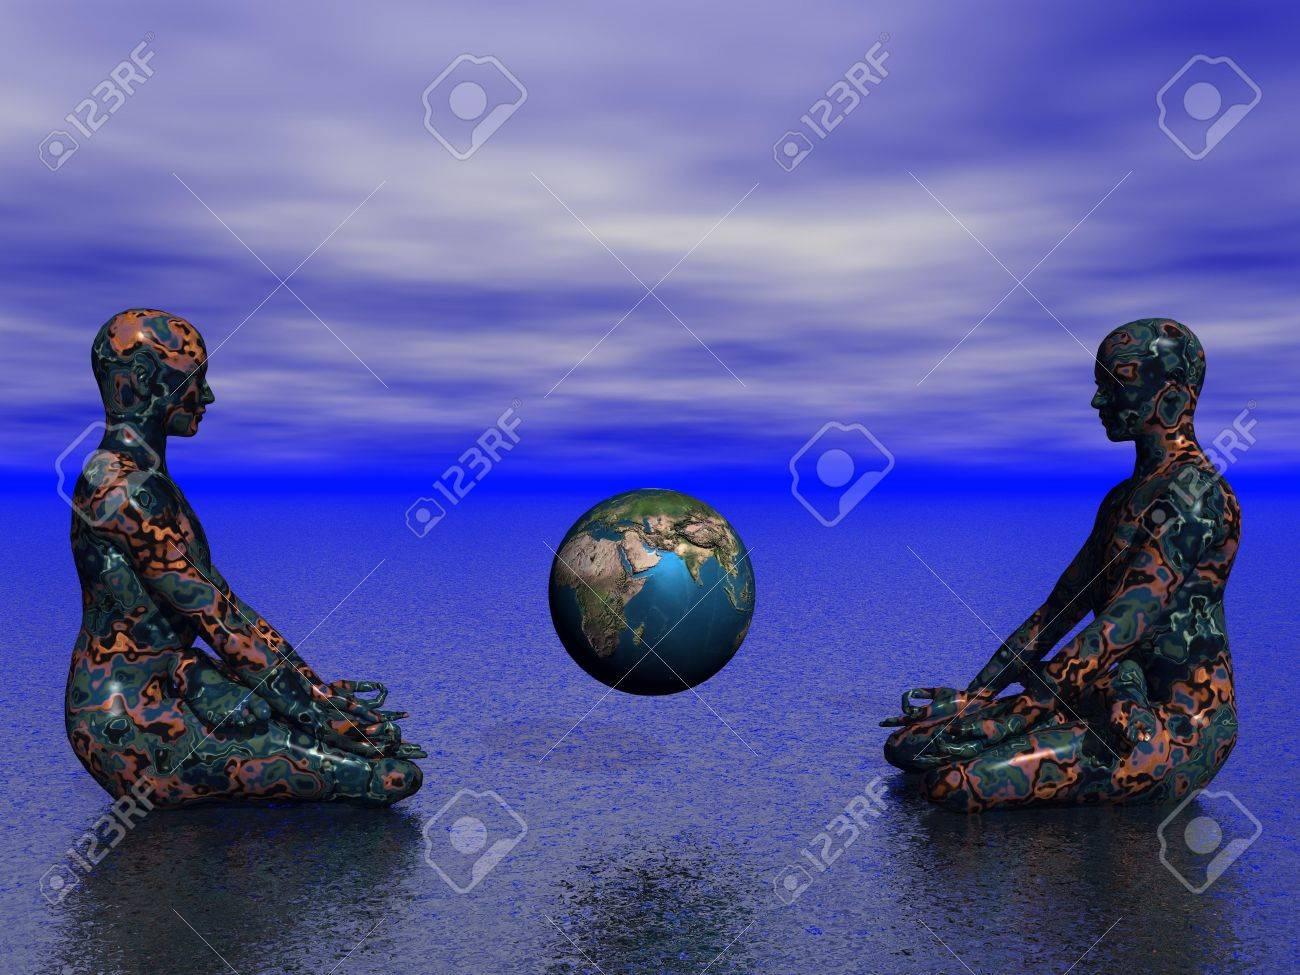 buddha and earth - 16443290